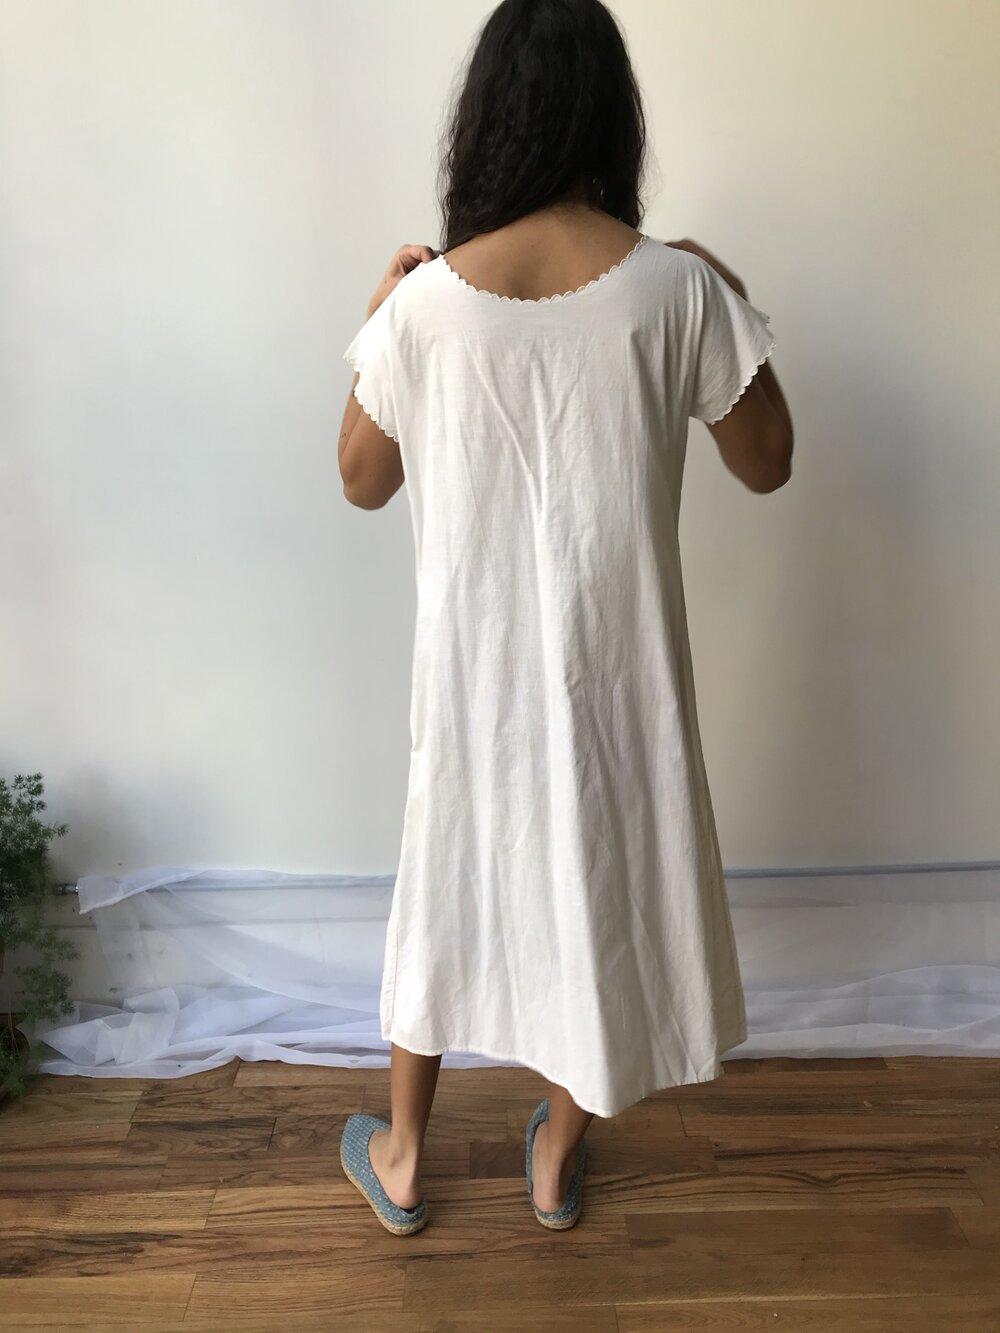 Artemis Cotton Eyelet Trim Dress Antique Vintage Embroidered White Ivory Muslin Nightgown